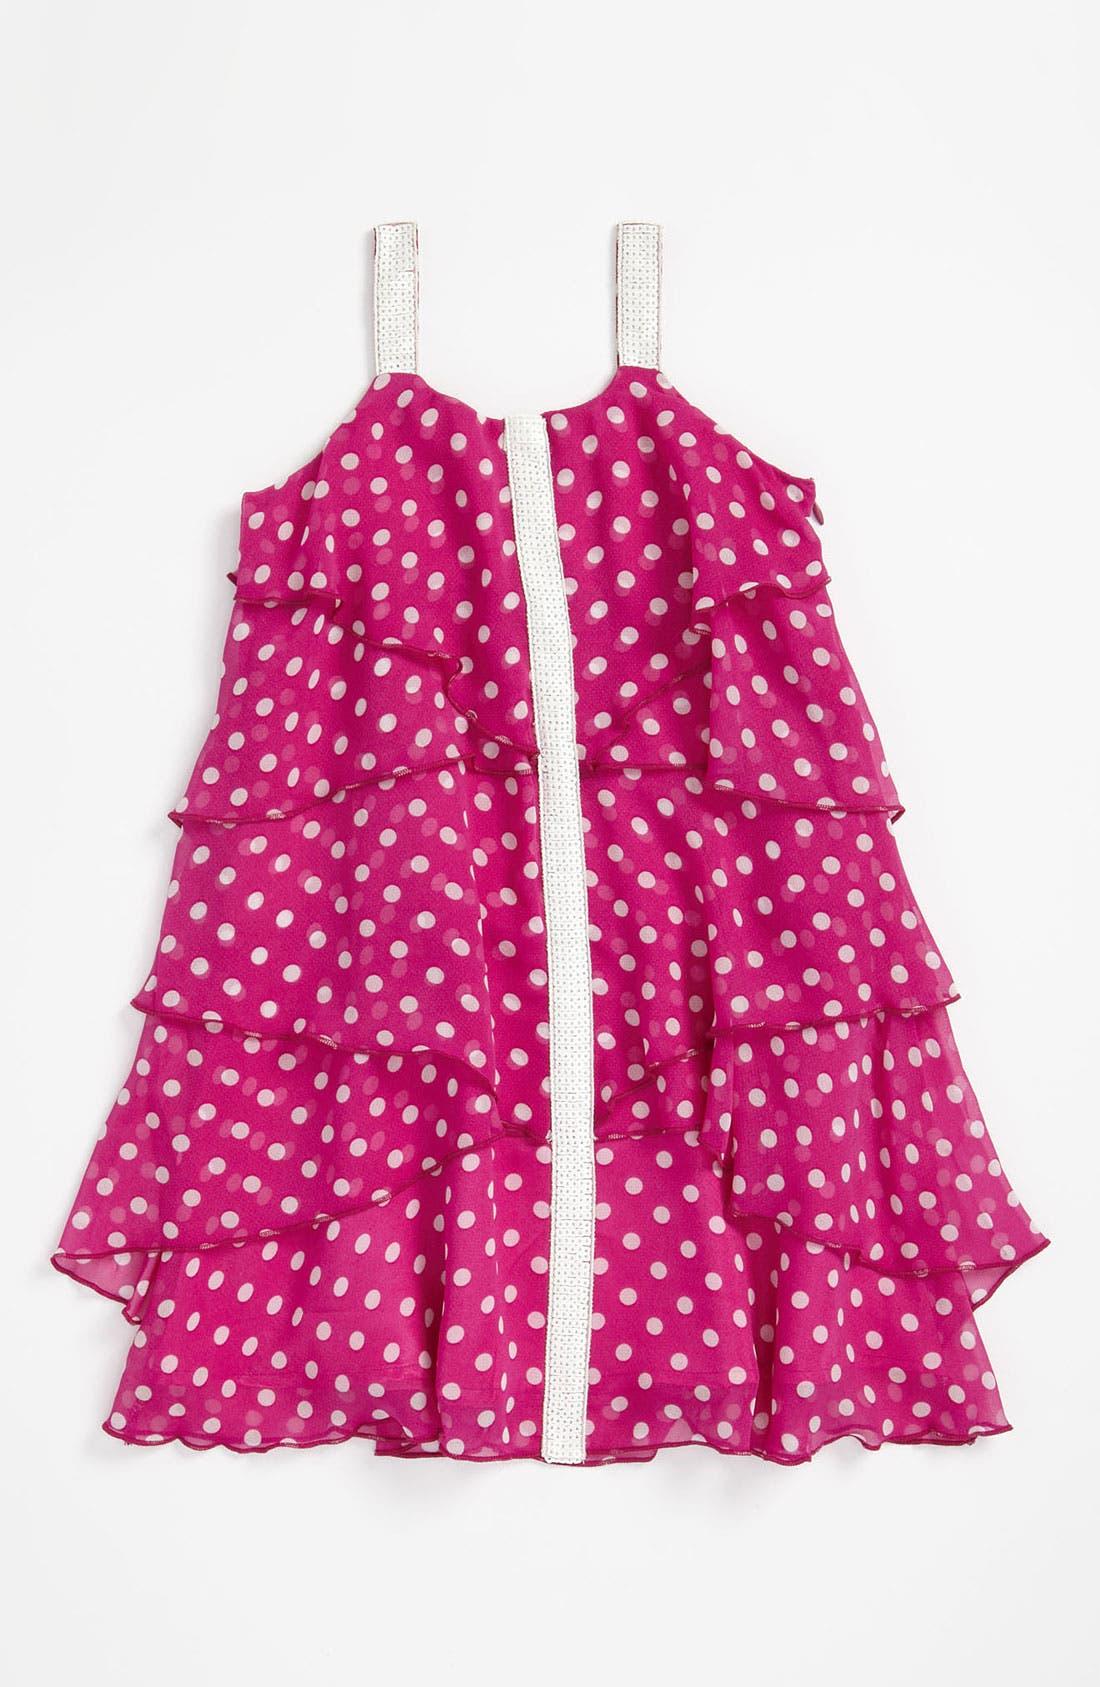 Alternate Image 1 Selected - Elisa B Chiffon Print Dress (Little Girls & Big Girls)